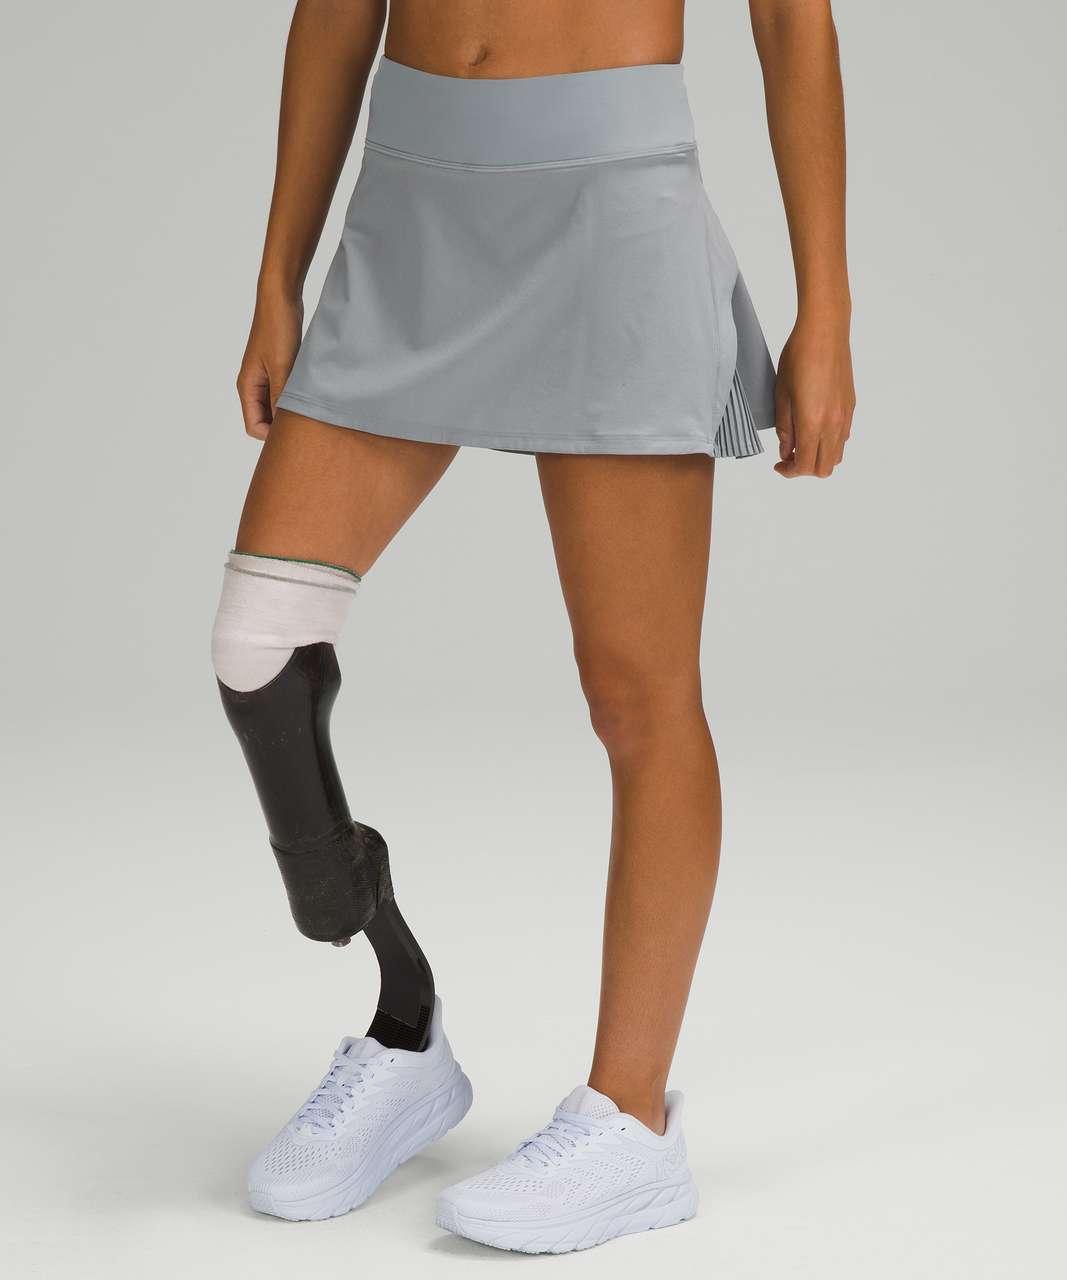 Lululemon Play Off The Pleats Mid Rise Skirt - Rhino Grey